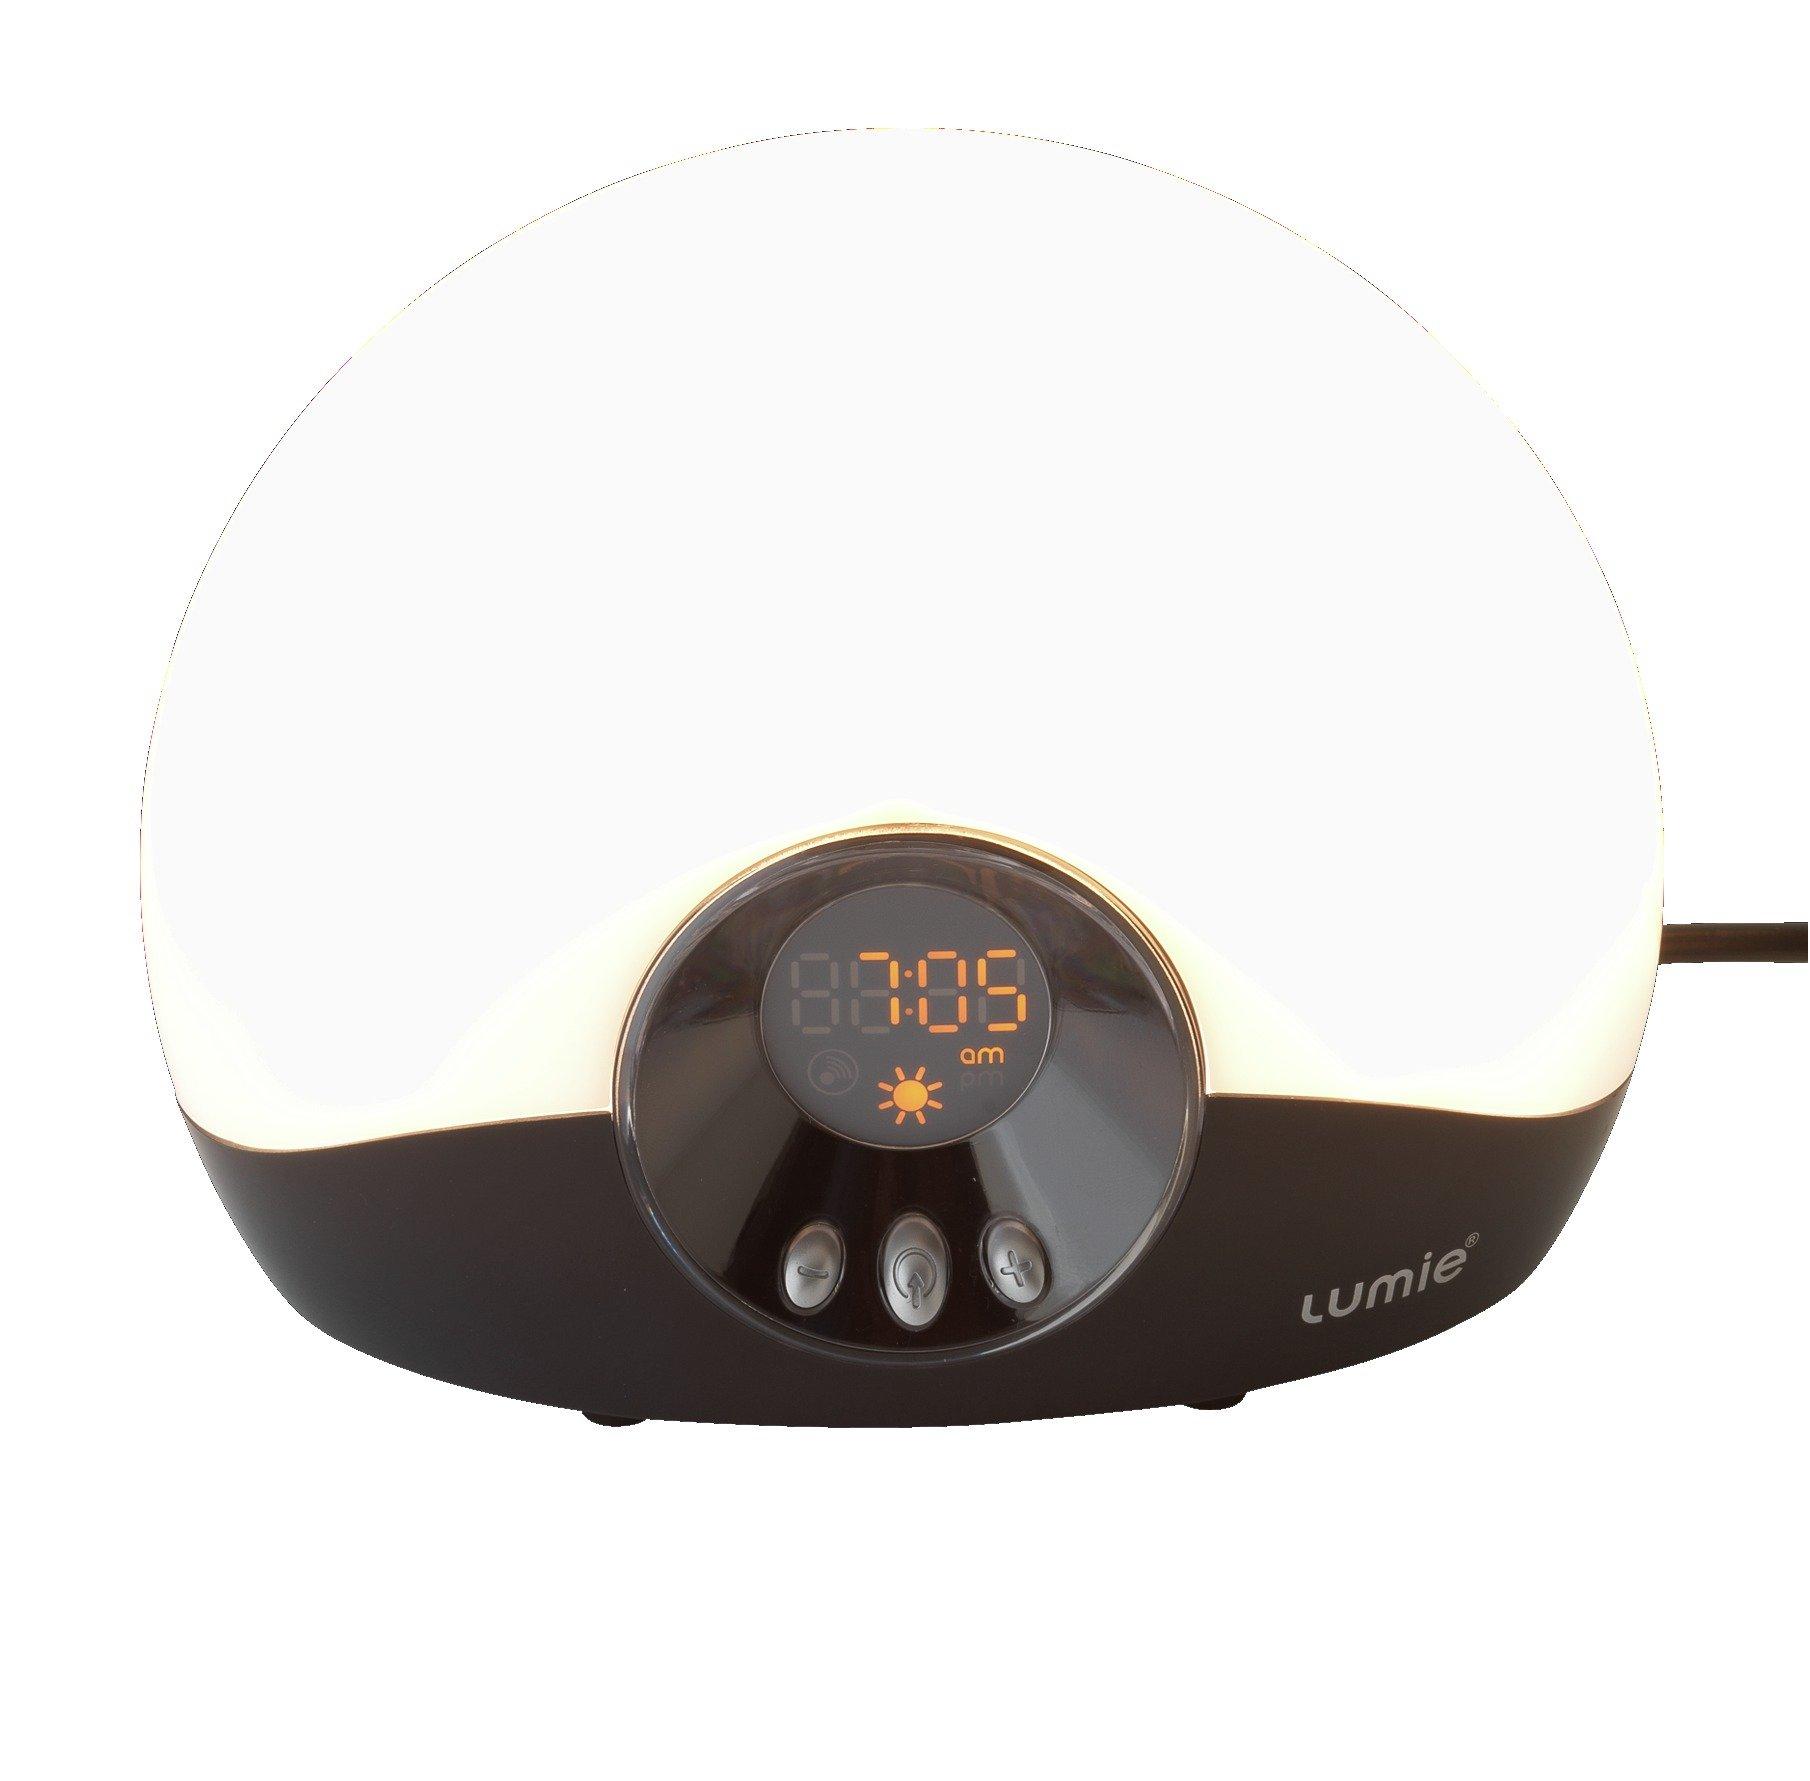 Lumie Bodyclock Go 75 Wake-Up Light Alarm Clock